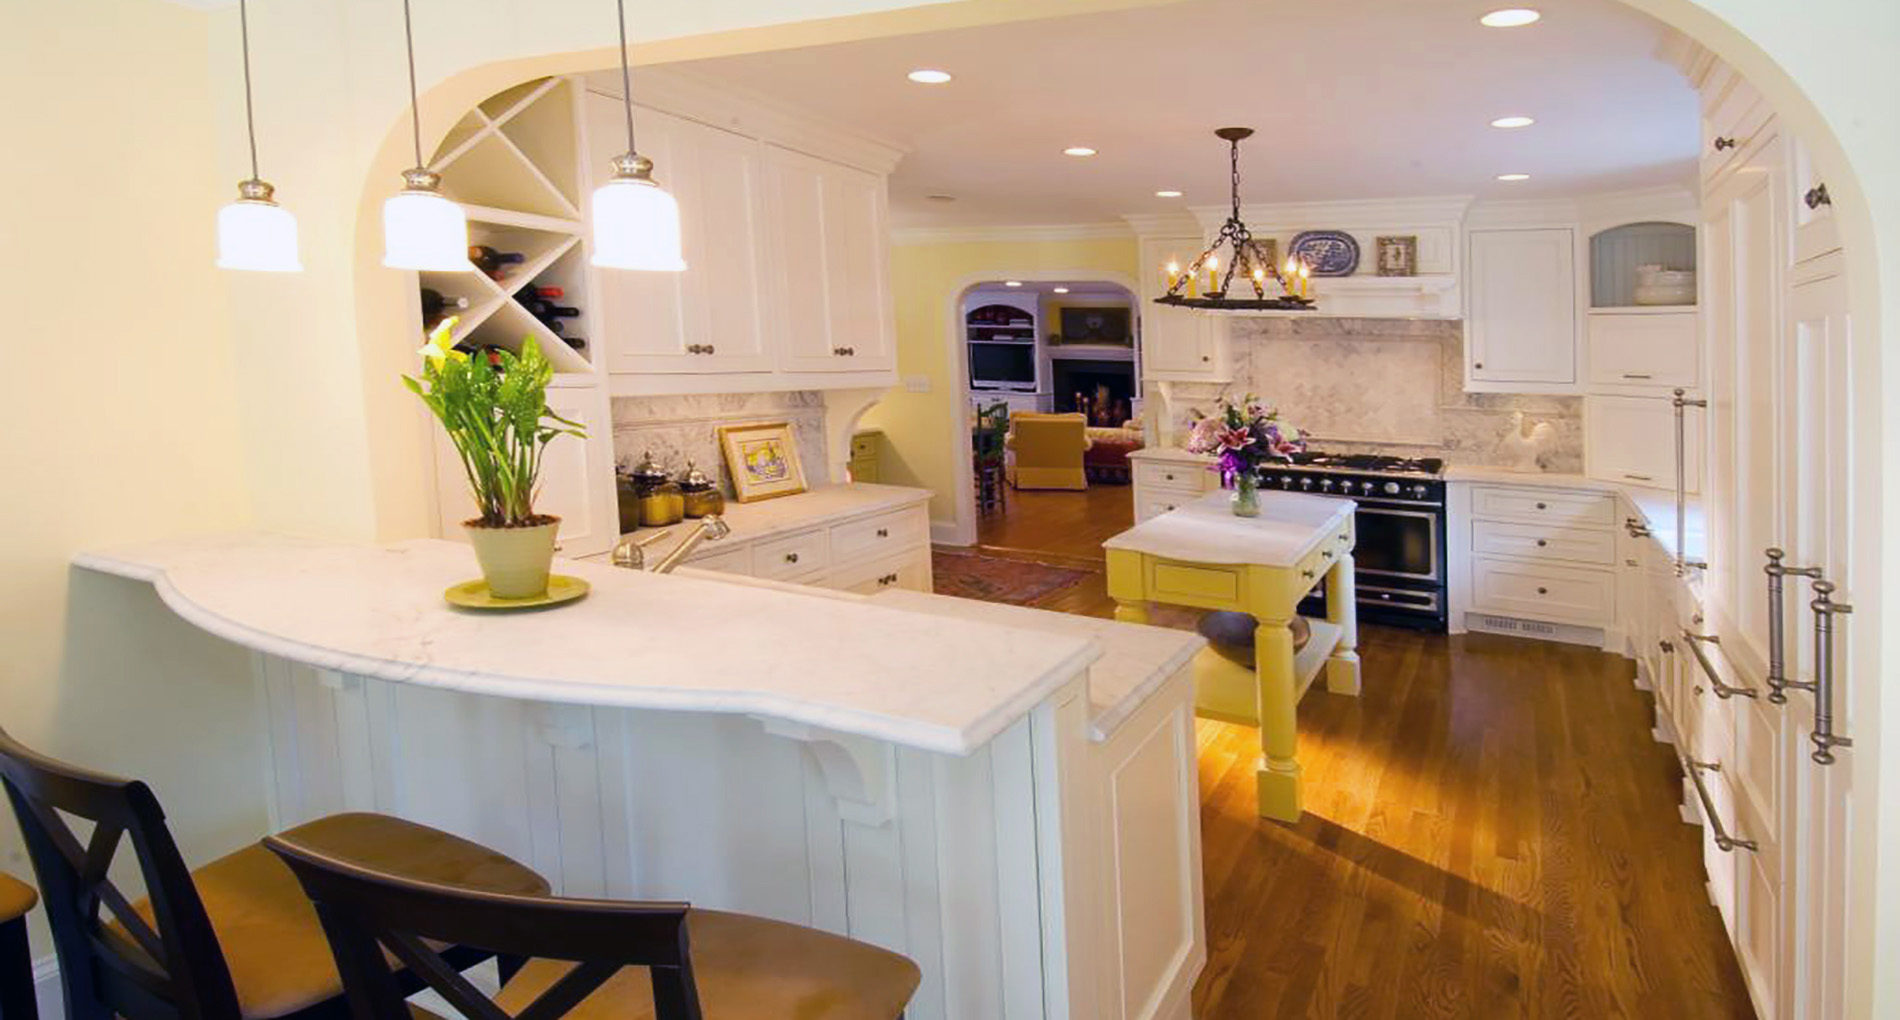 kitchen remodeling & design in greensboro | alair homes greensboro